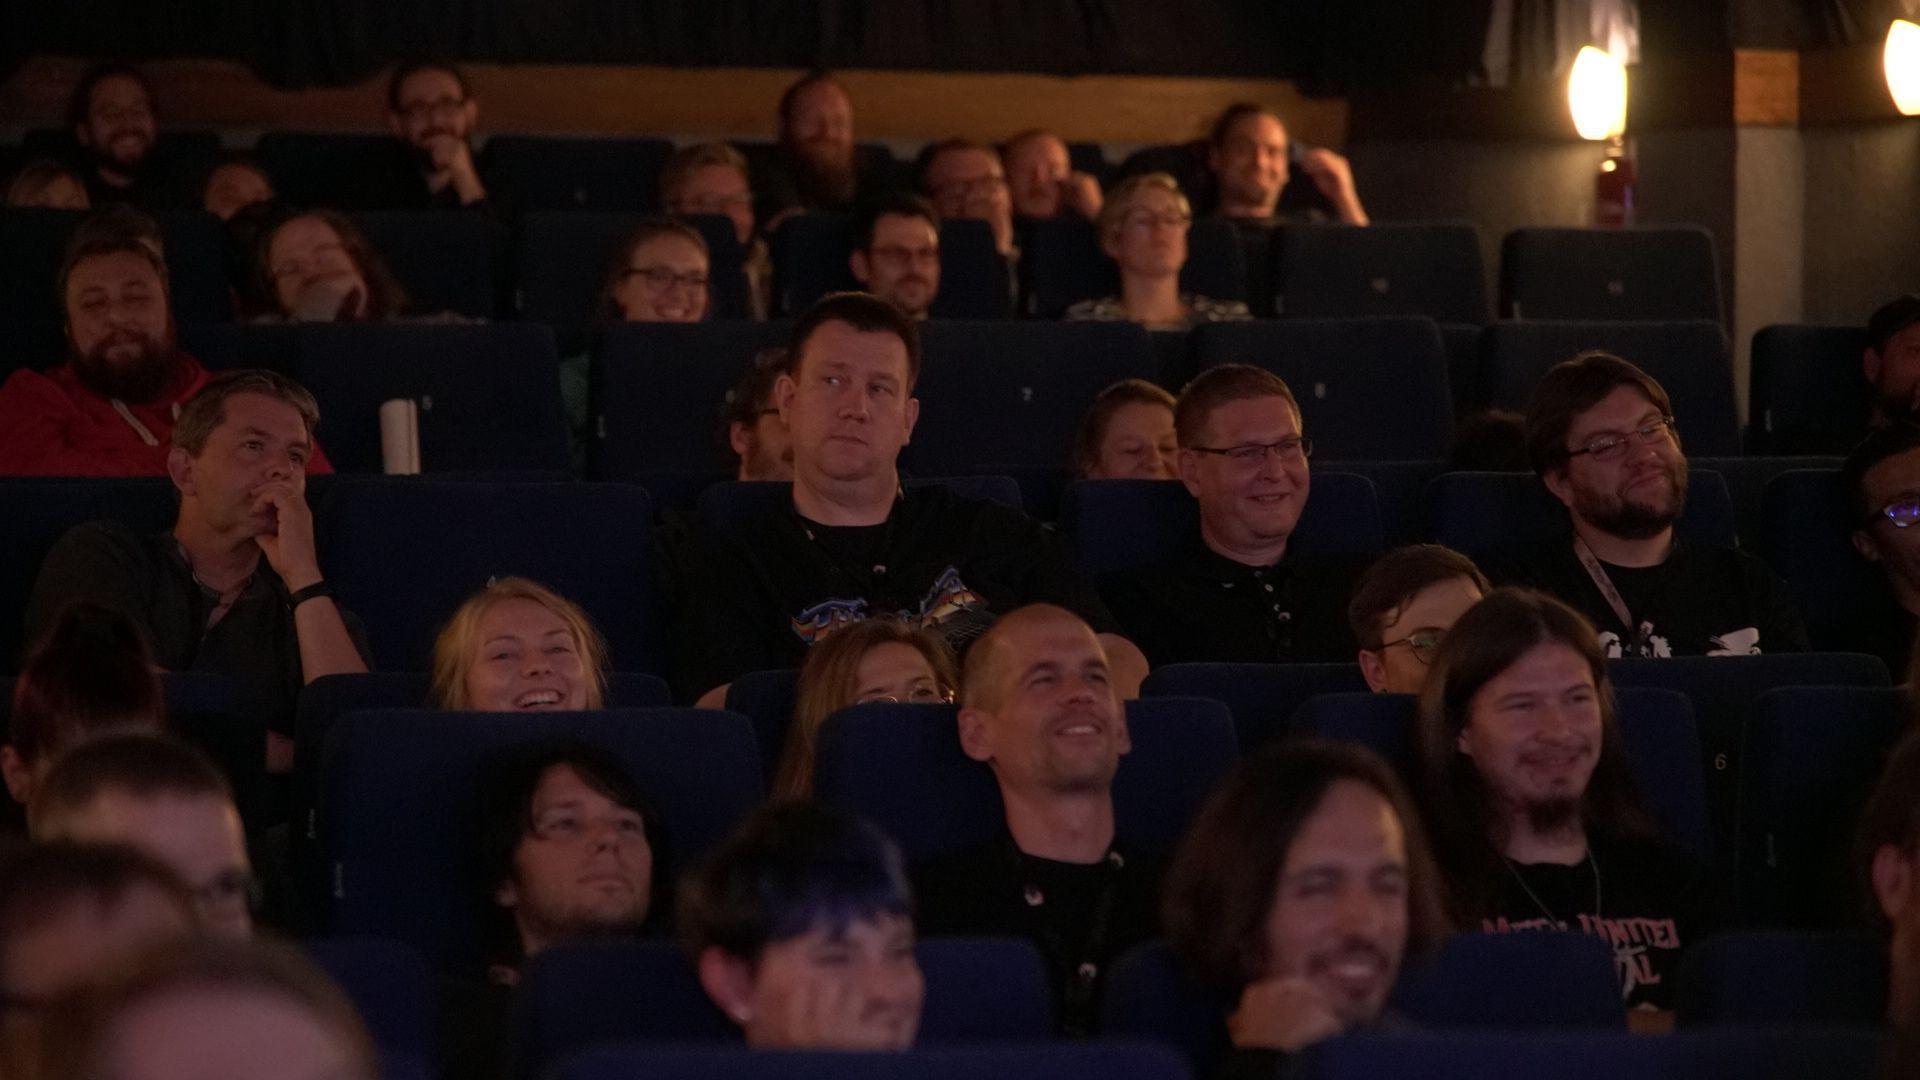 1 - Audience